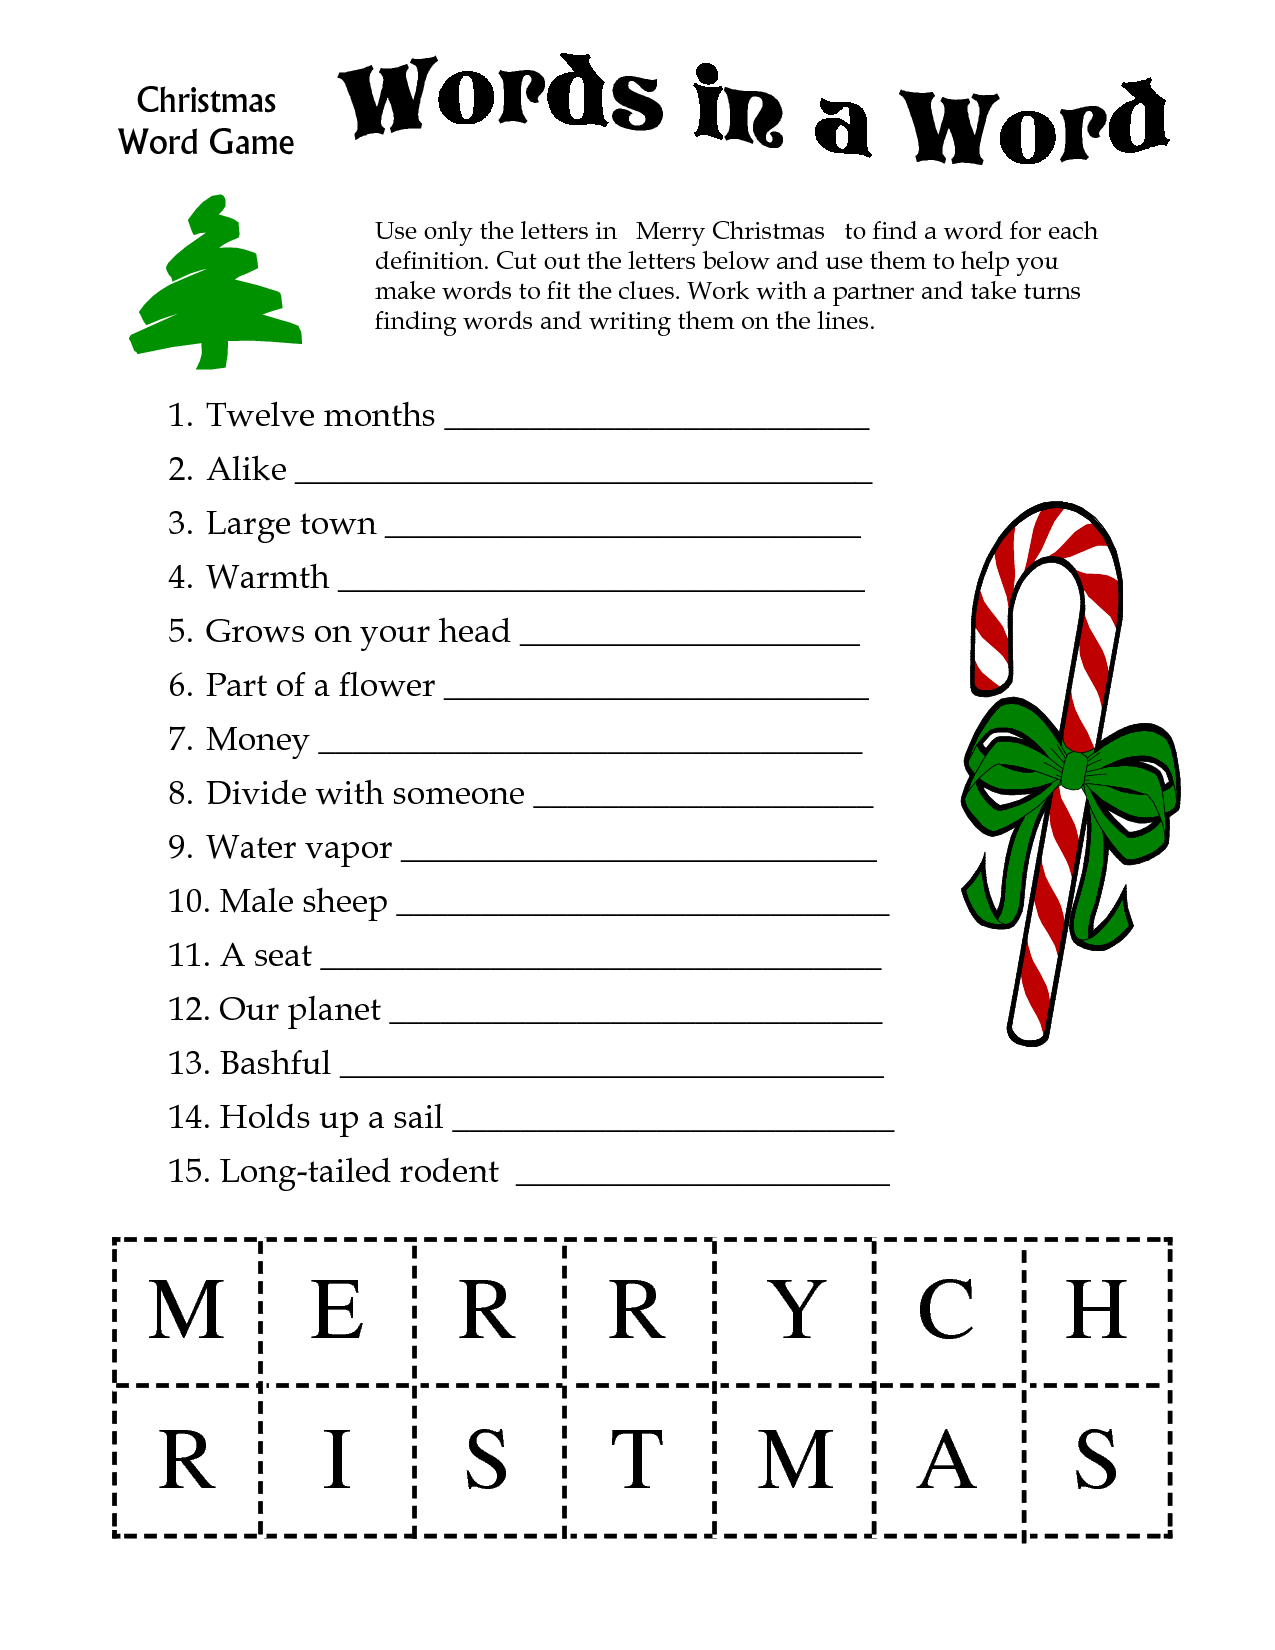 7 Images of Printable Hard Christmas Word Games